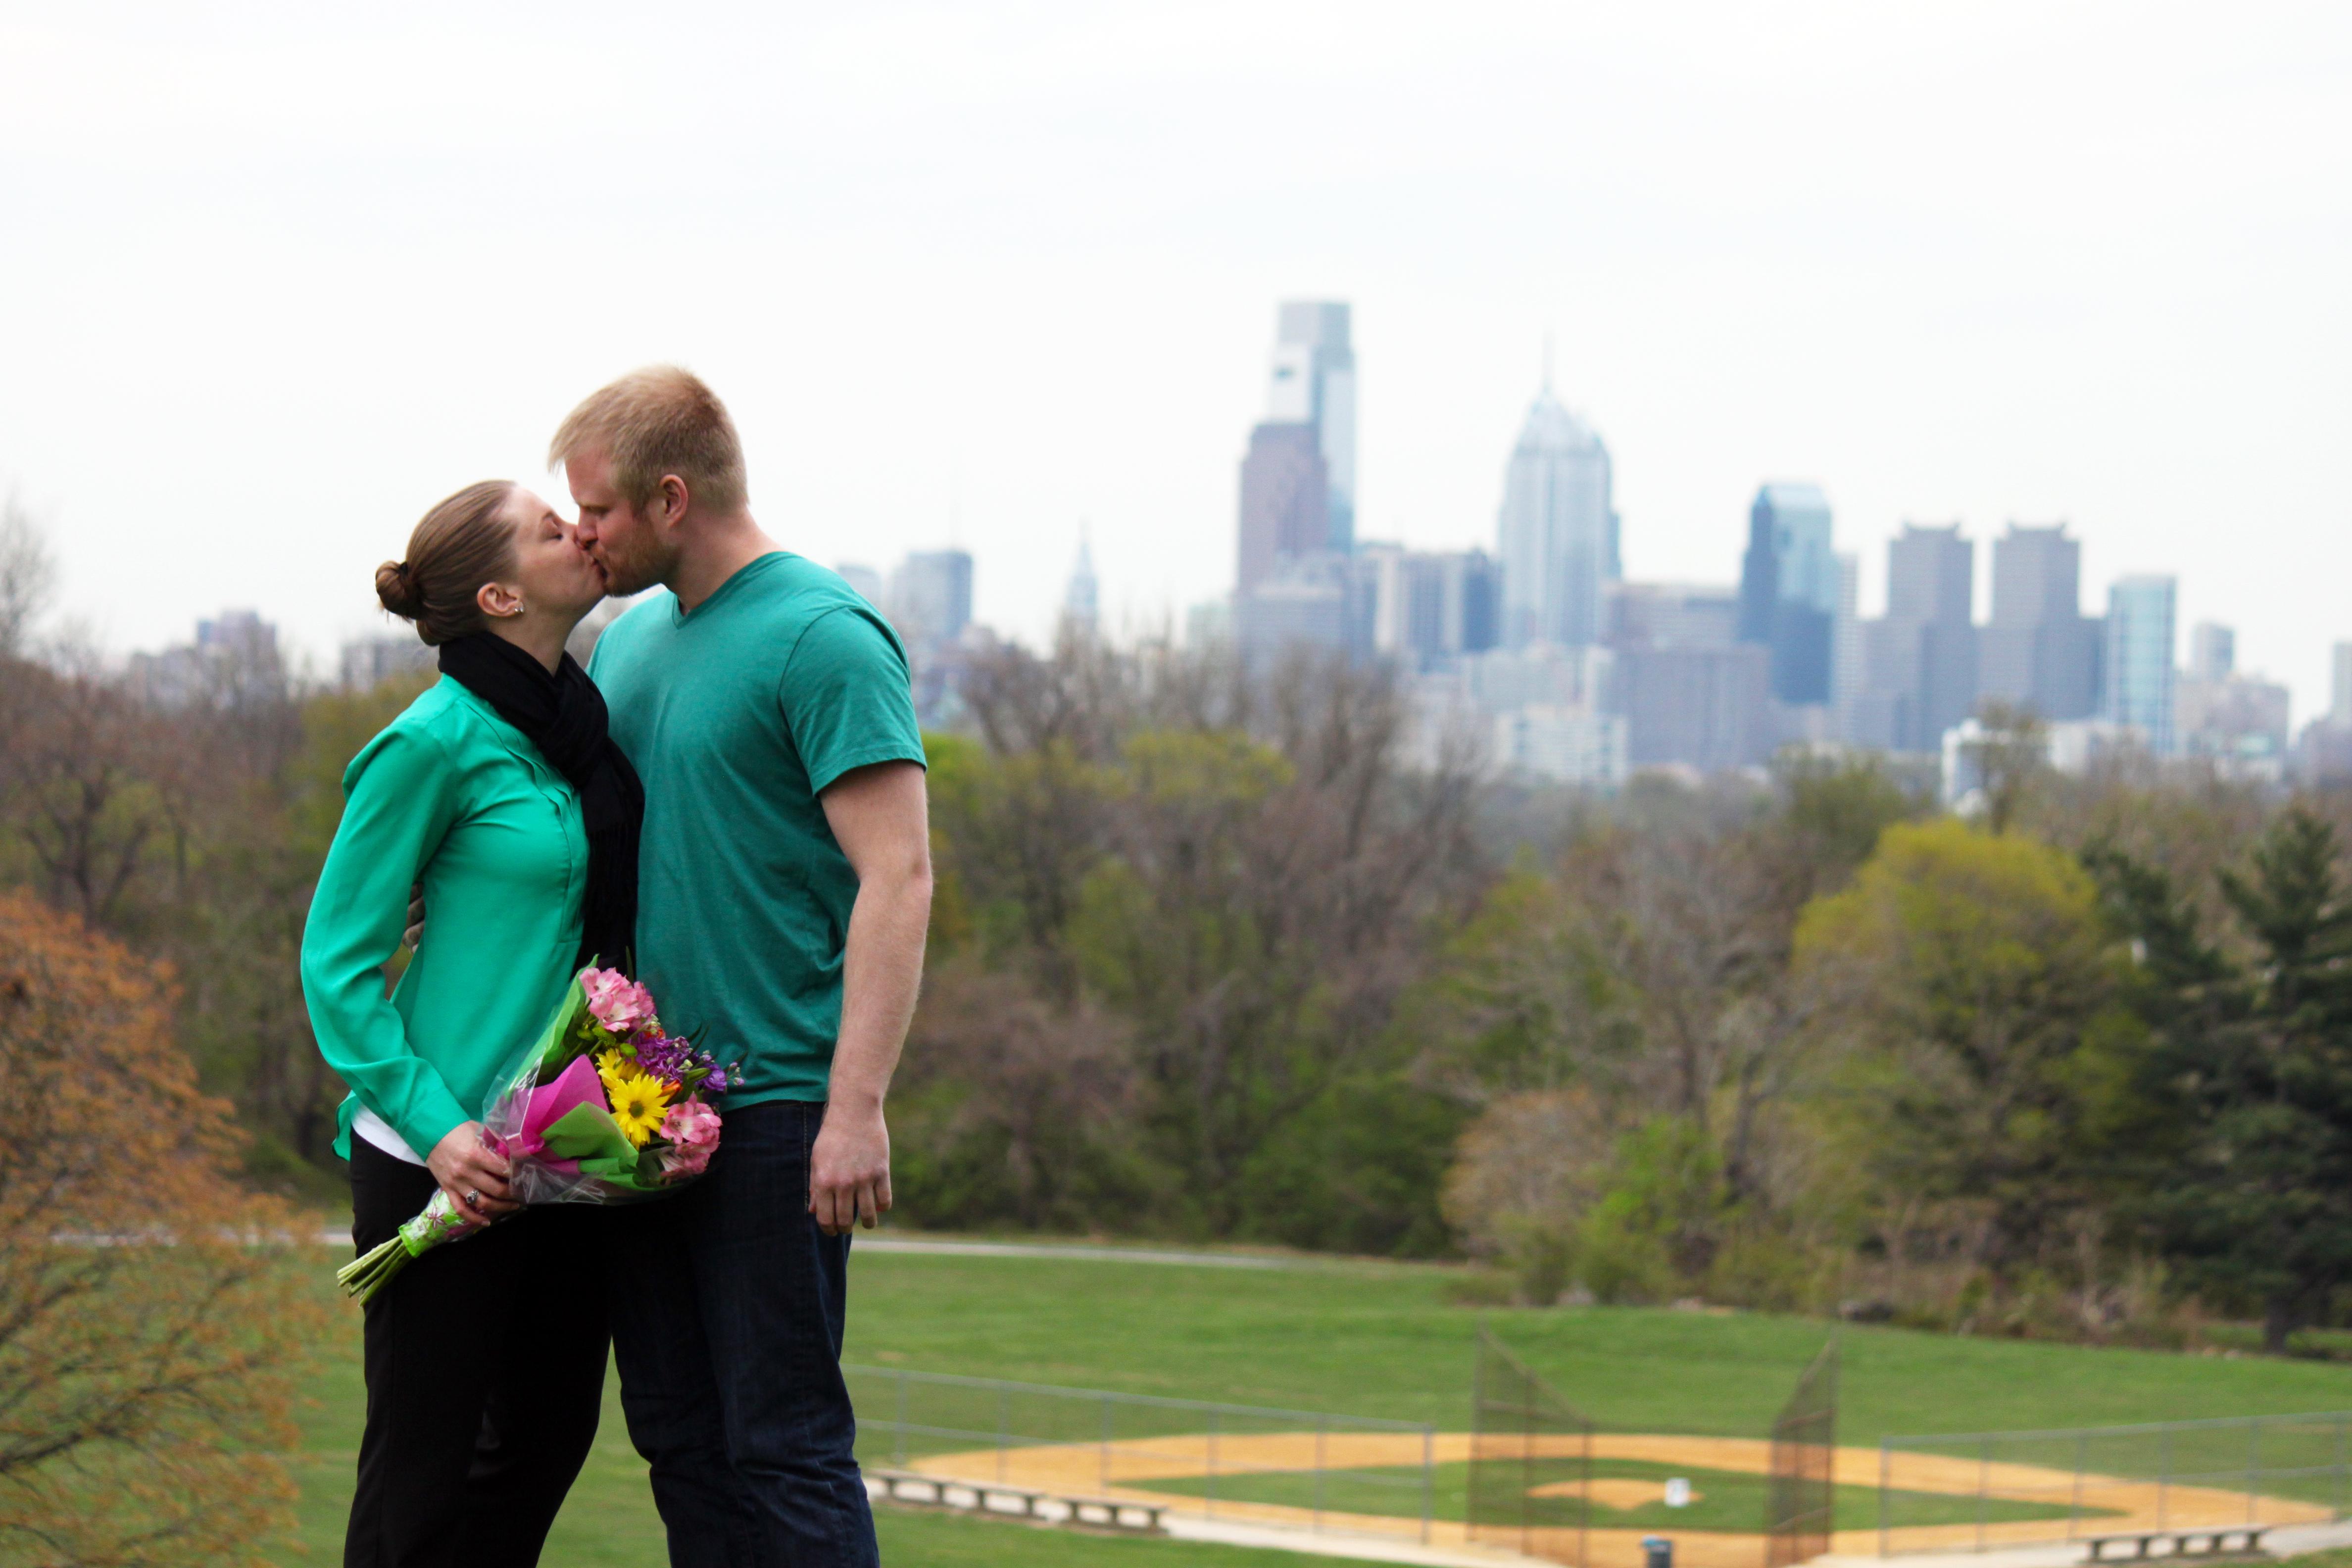 Image 1 of Amy and Tom   Philadelphia Marriage Proposal